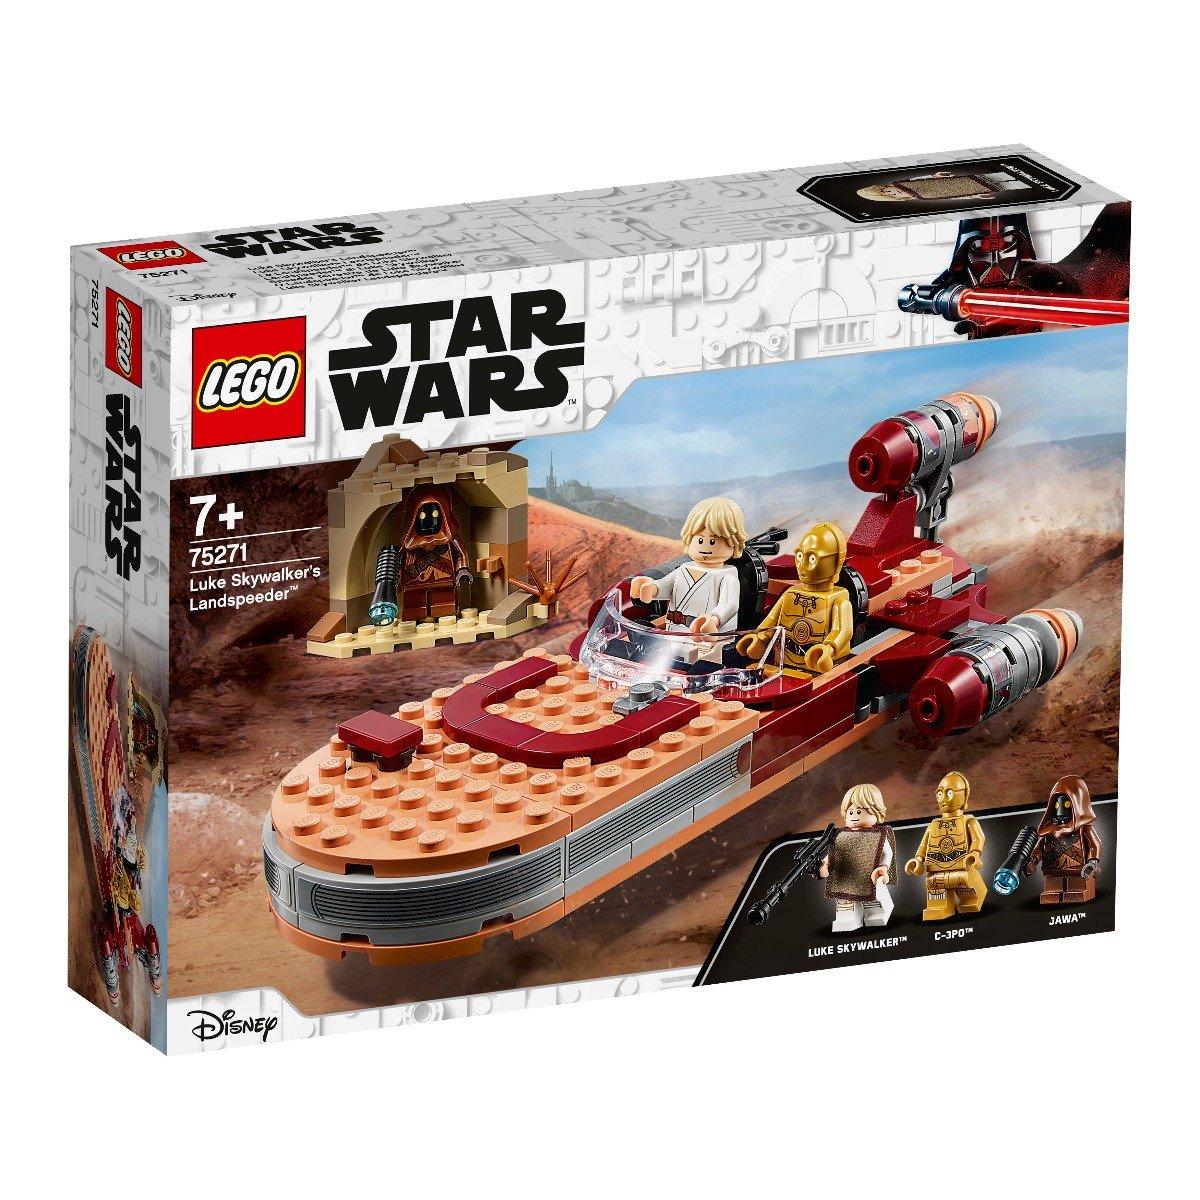 LEGO® Star Wars™ - Landspeeder a lui Luke Skywalker (75271) imagine